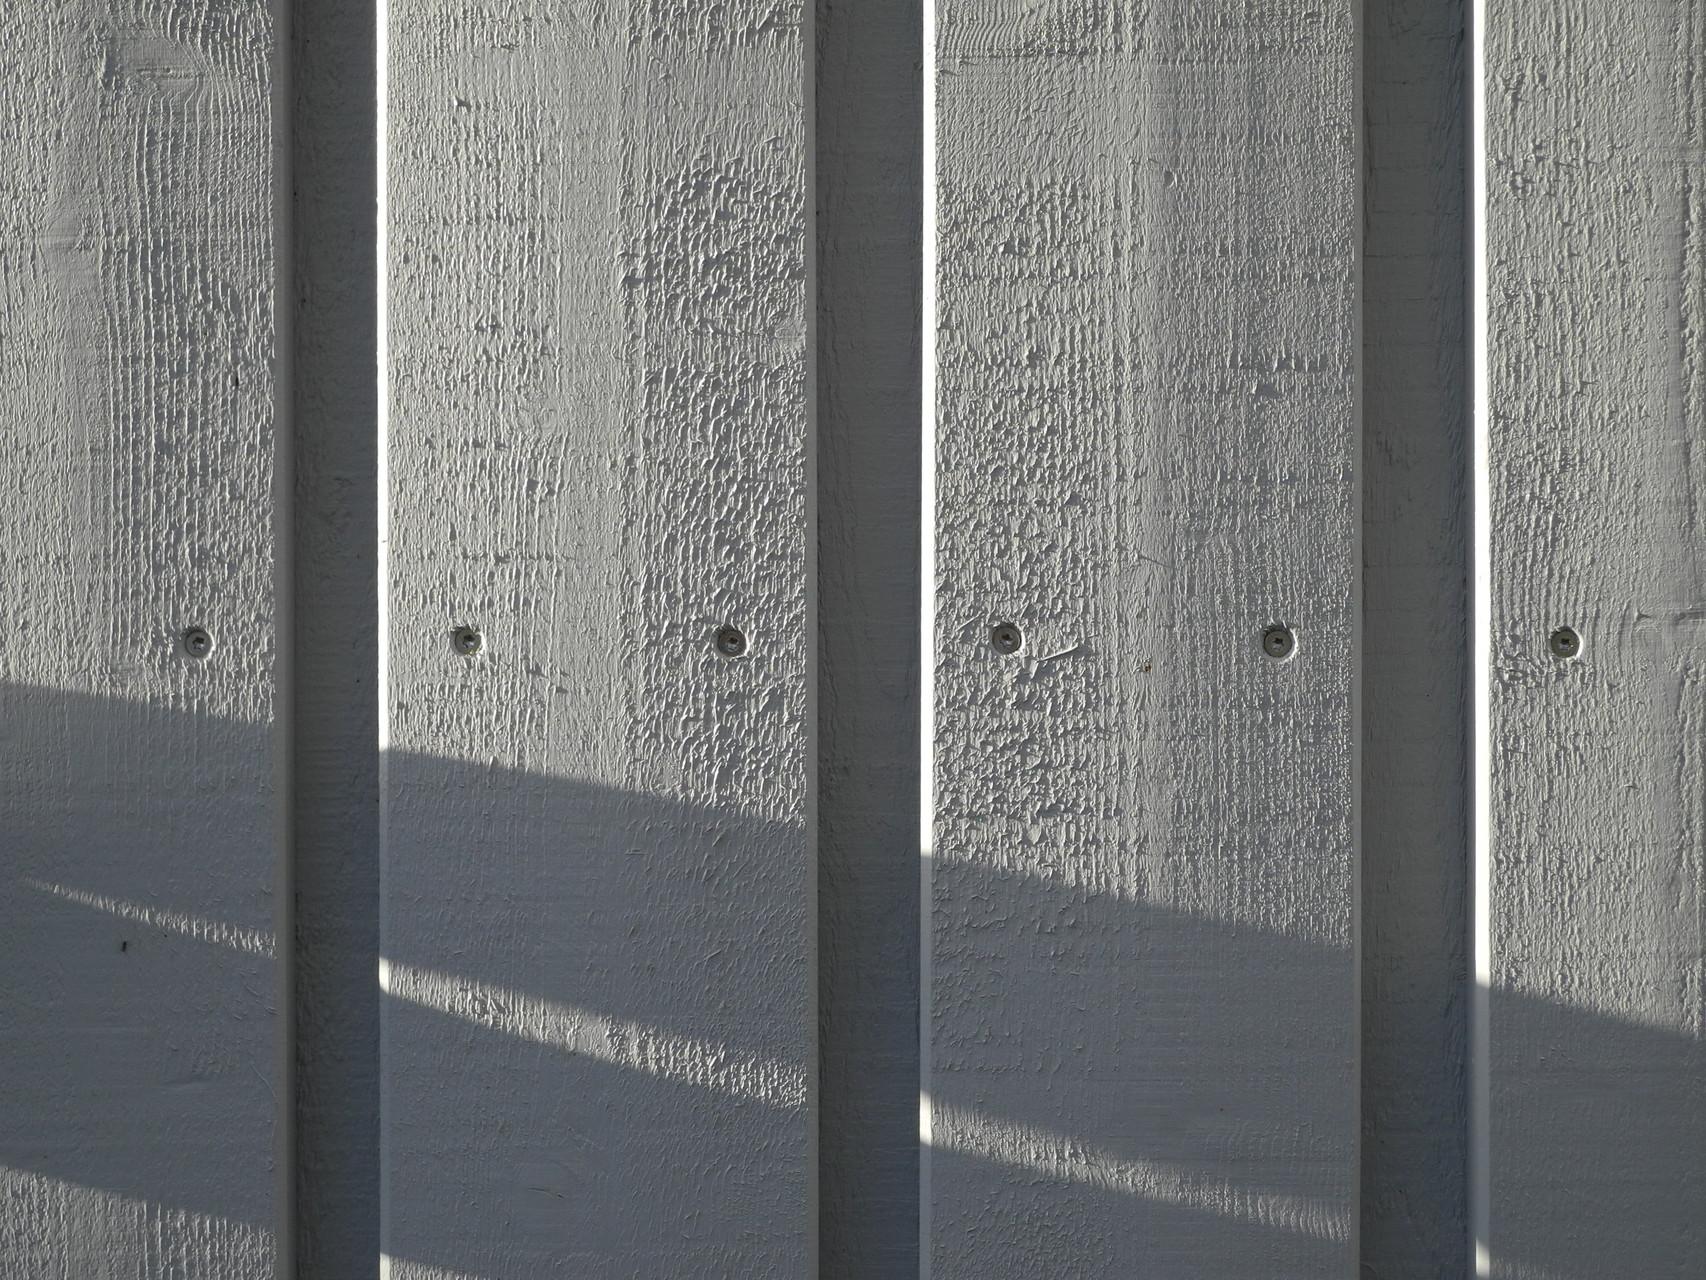 Topf-Deckel- bzw. Kriecher-Decker-Schalung, deckend oberflächenbehandelt